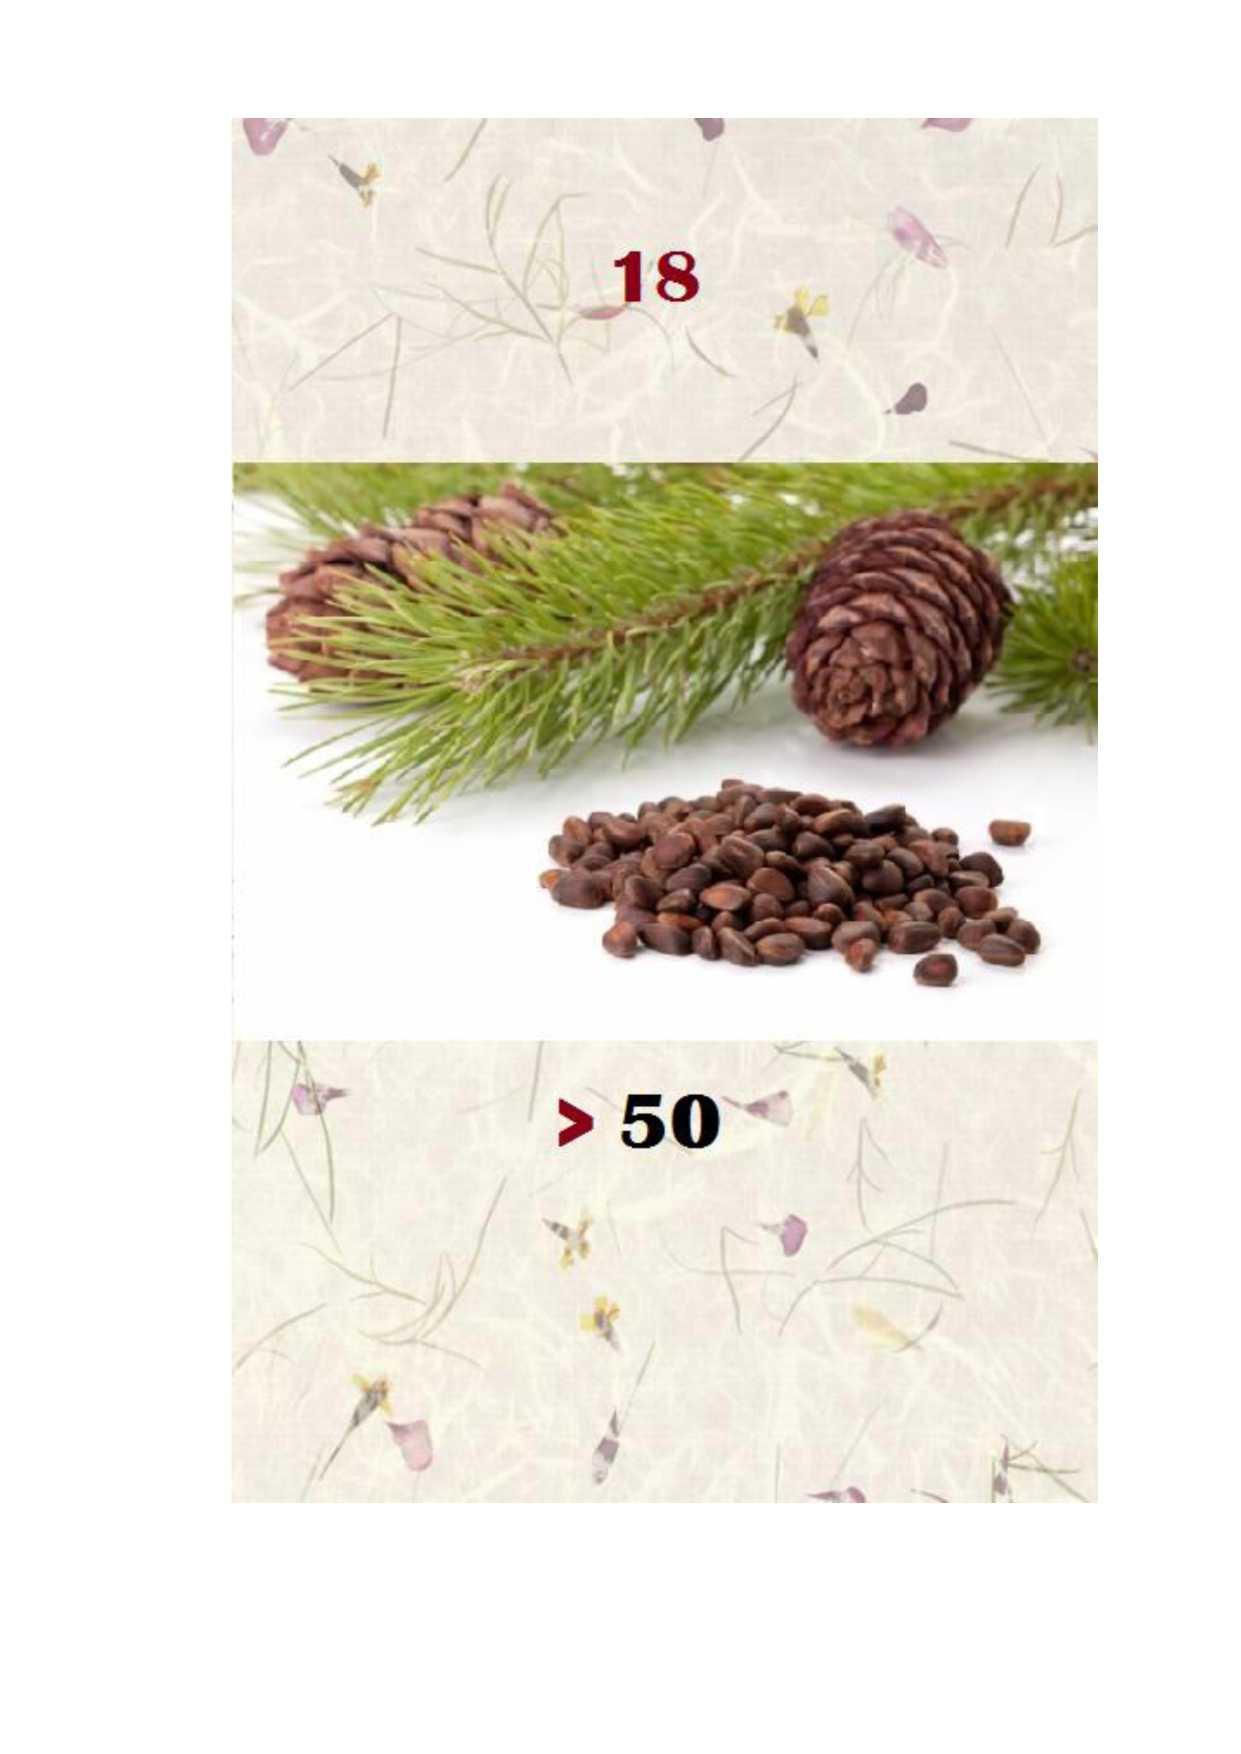 мг похудела редуксин 15-1